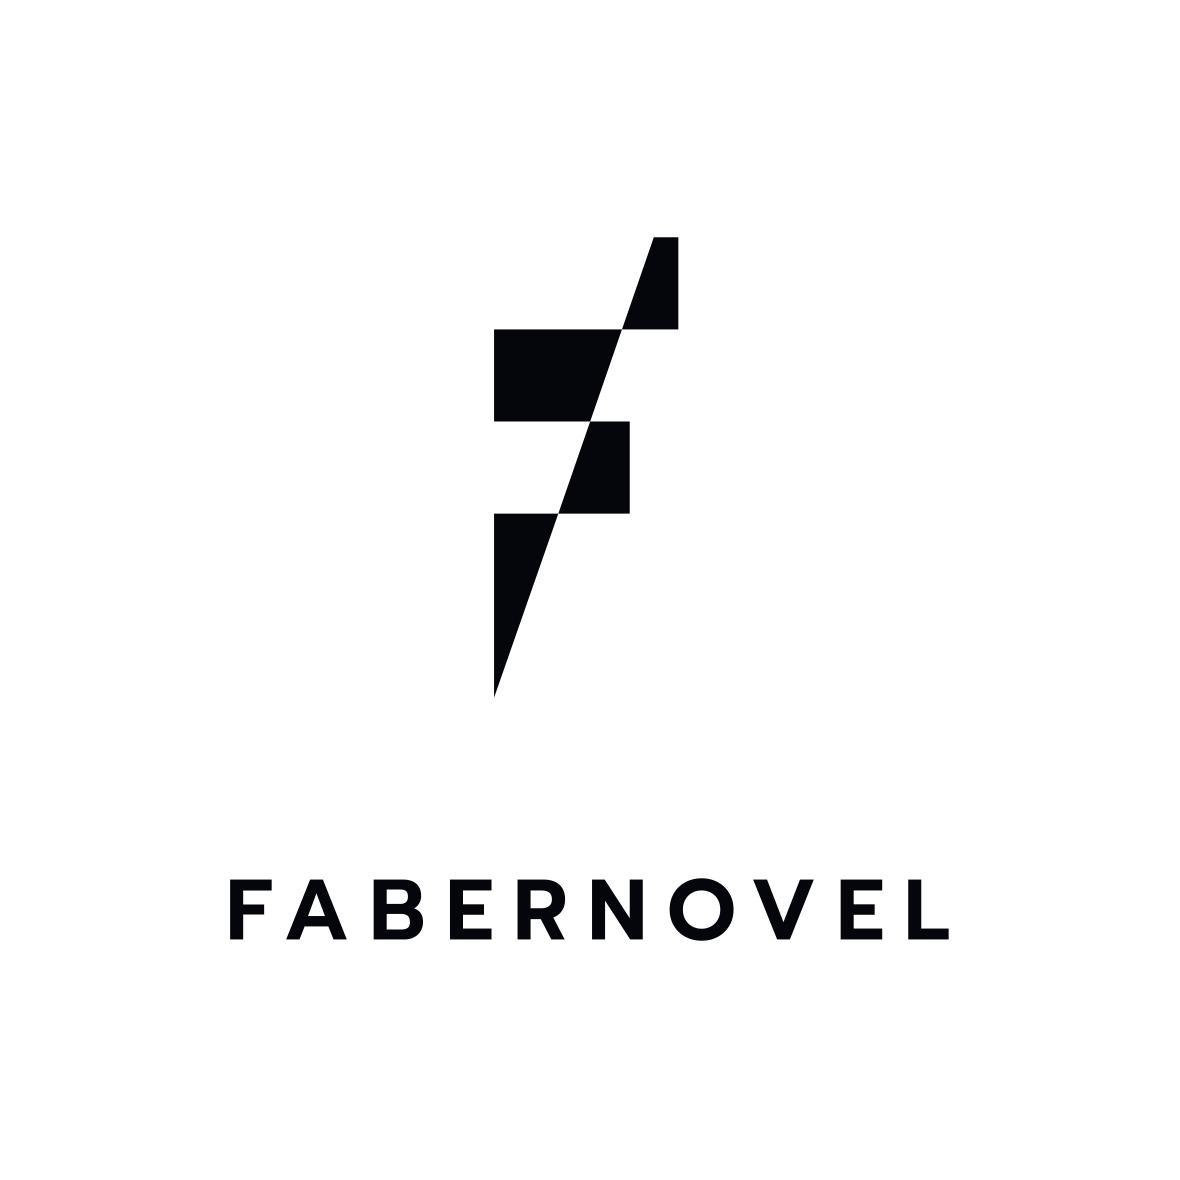 Fabernovel